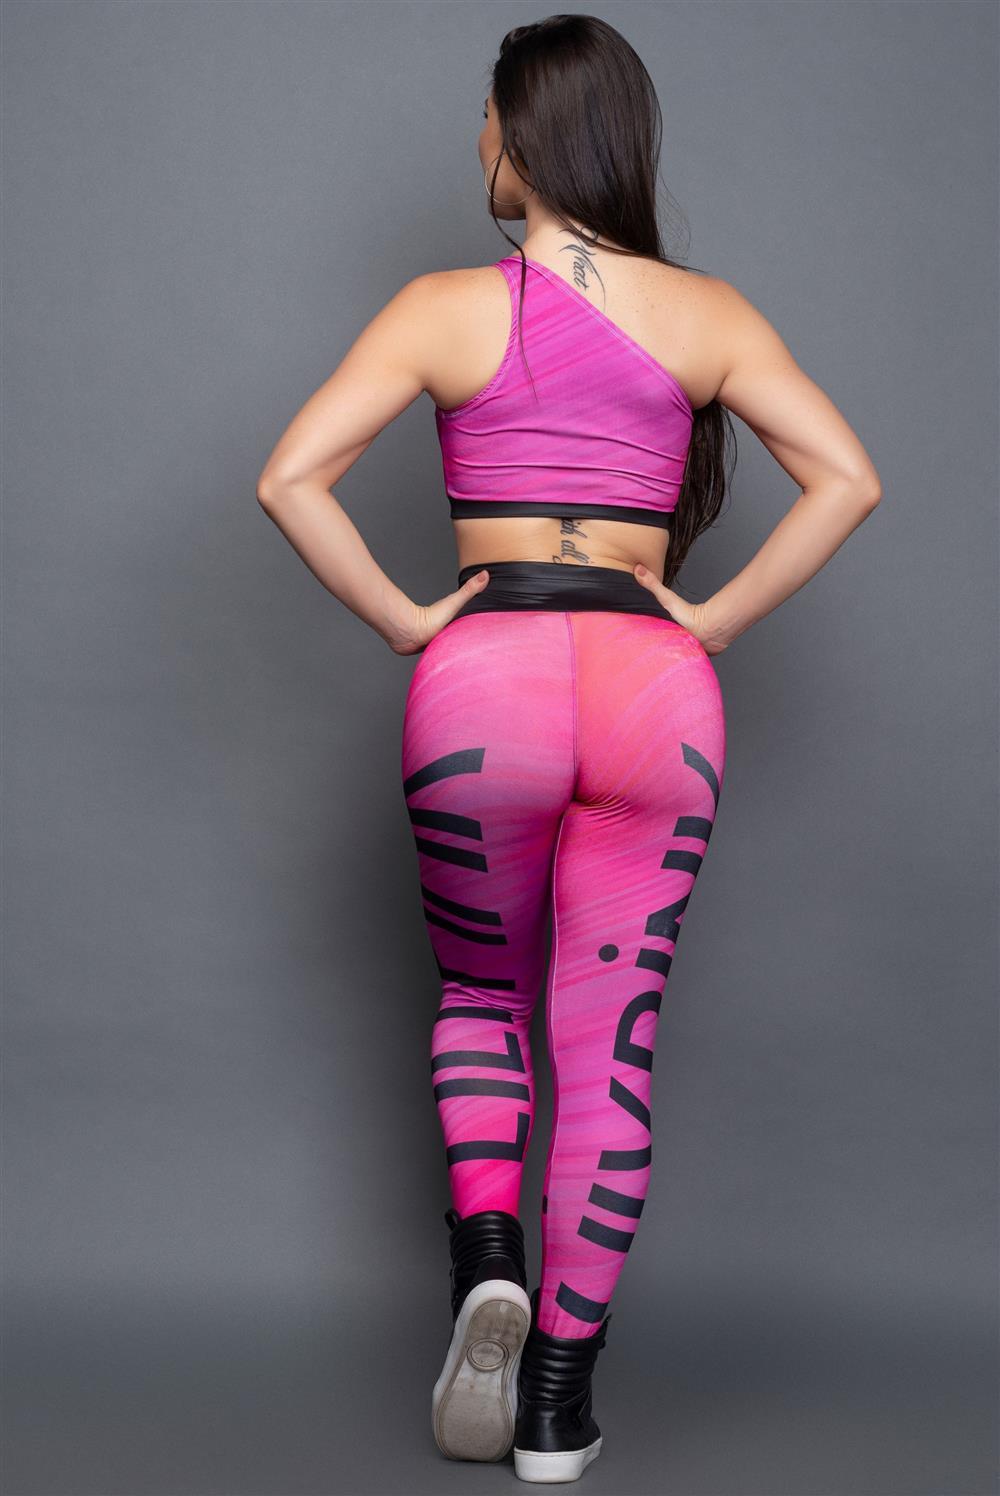 Conjunto Athletic Pink  - Fribasex - Fabricasex.com